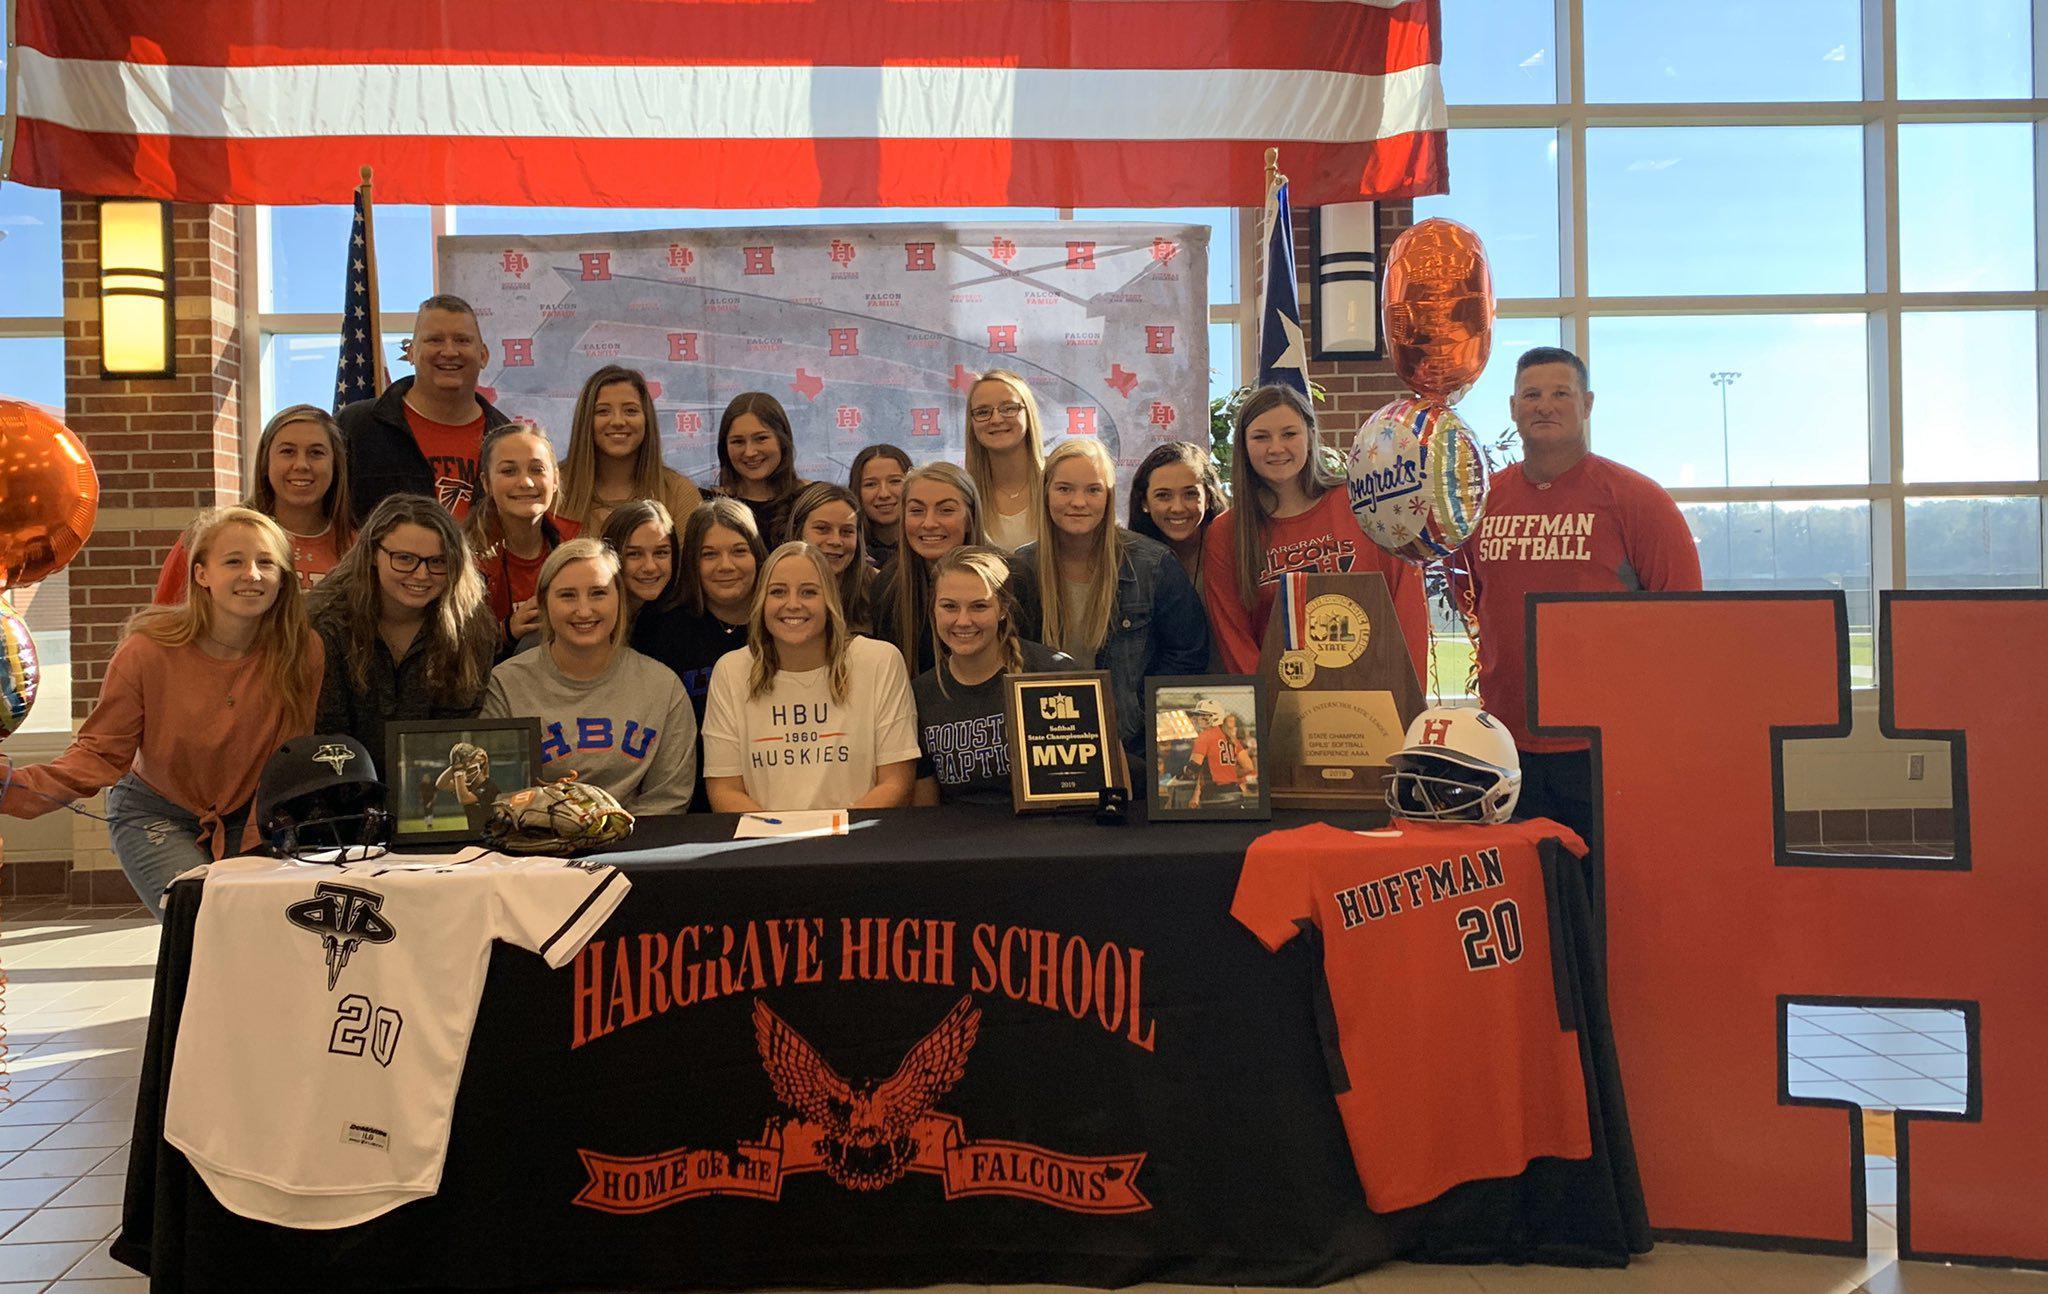 Hargrave softball MVP Katy Janes signs National Letter of Intent with Houston Baptist University